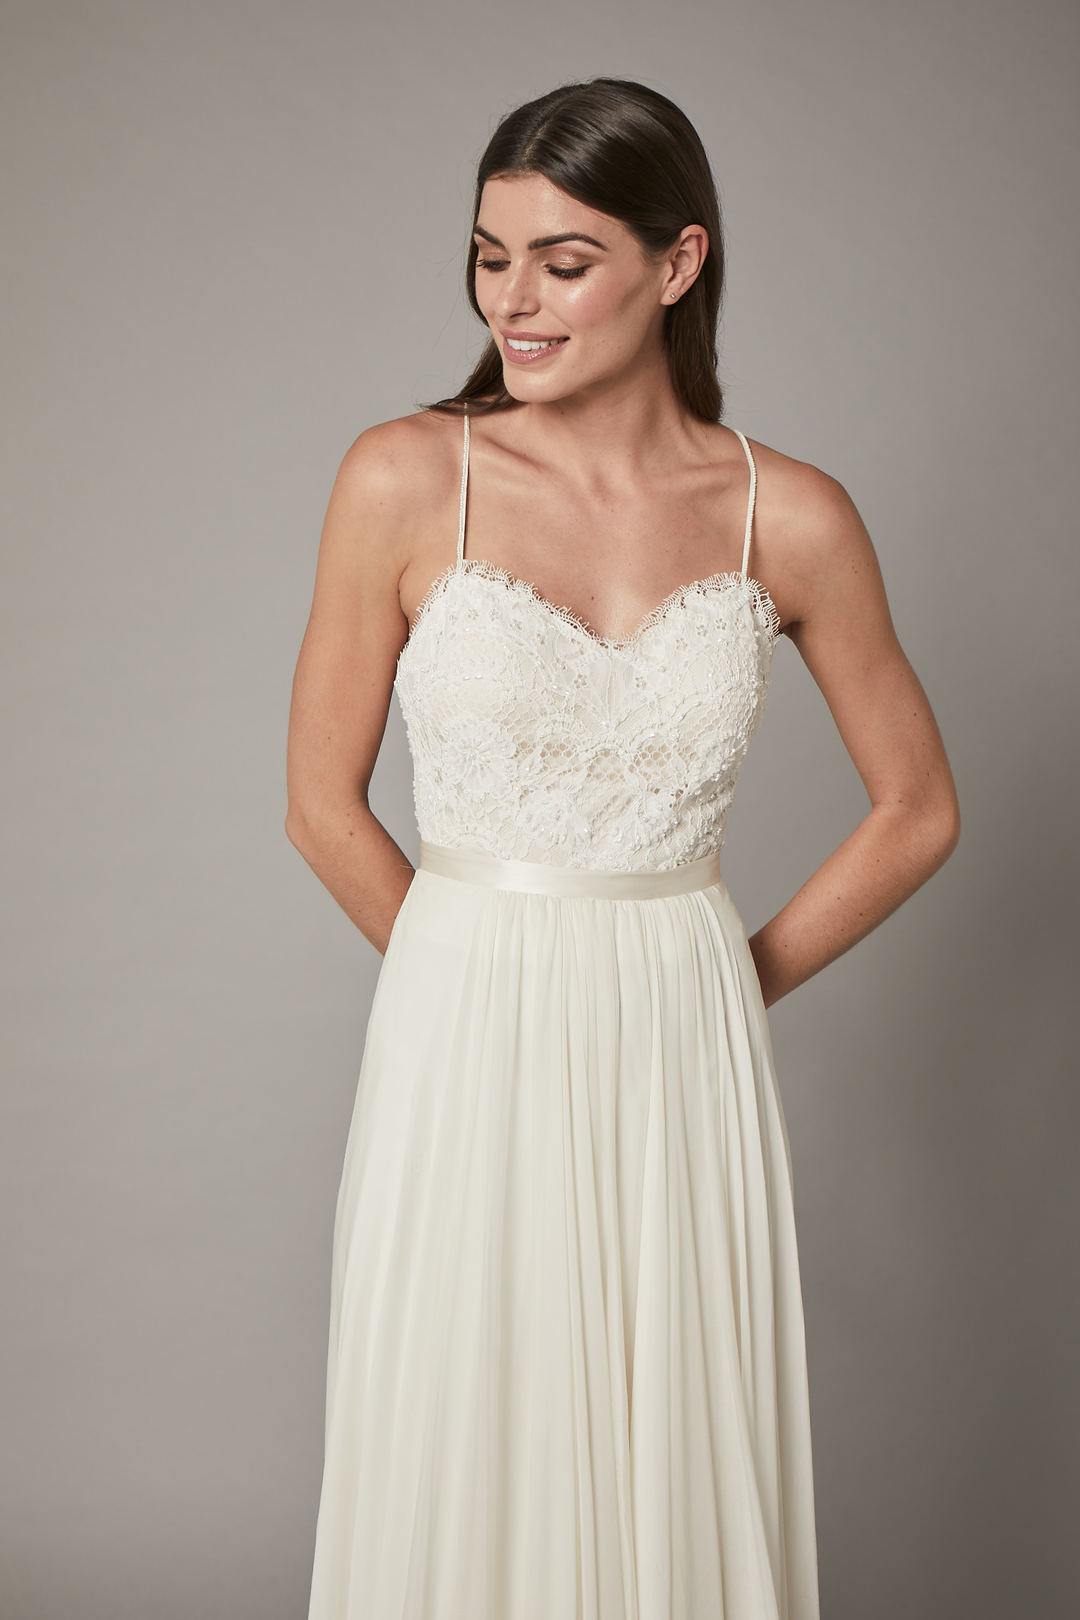 river corset dress photo